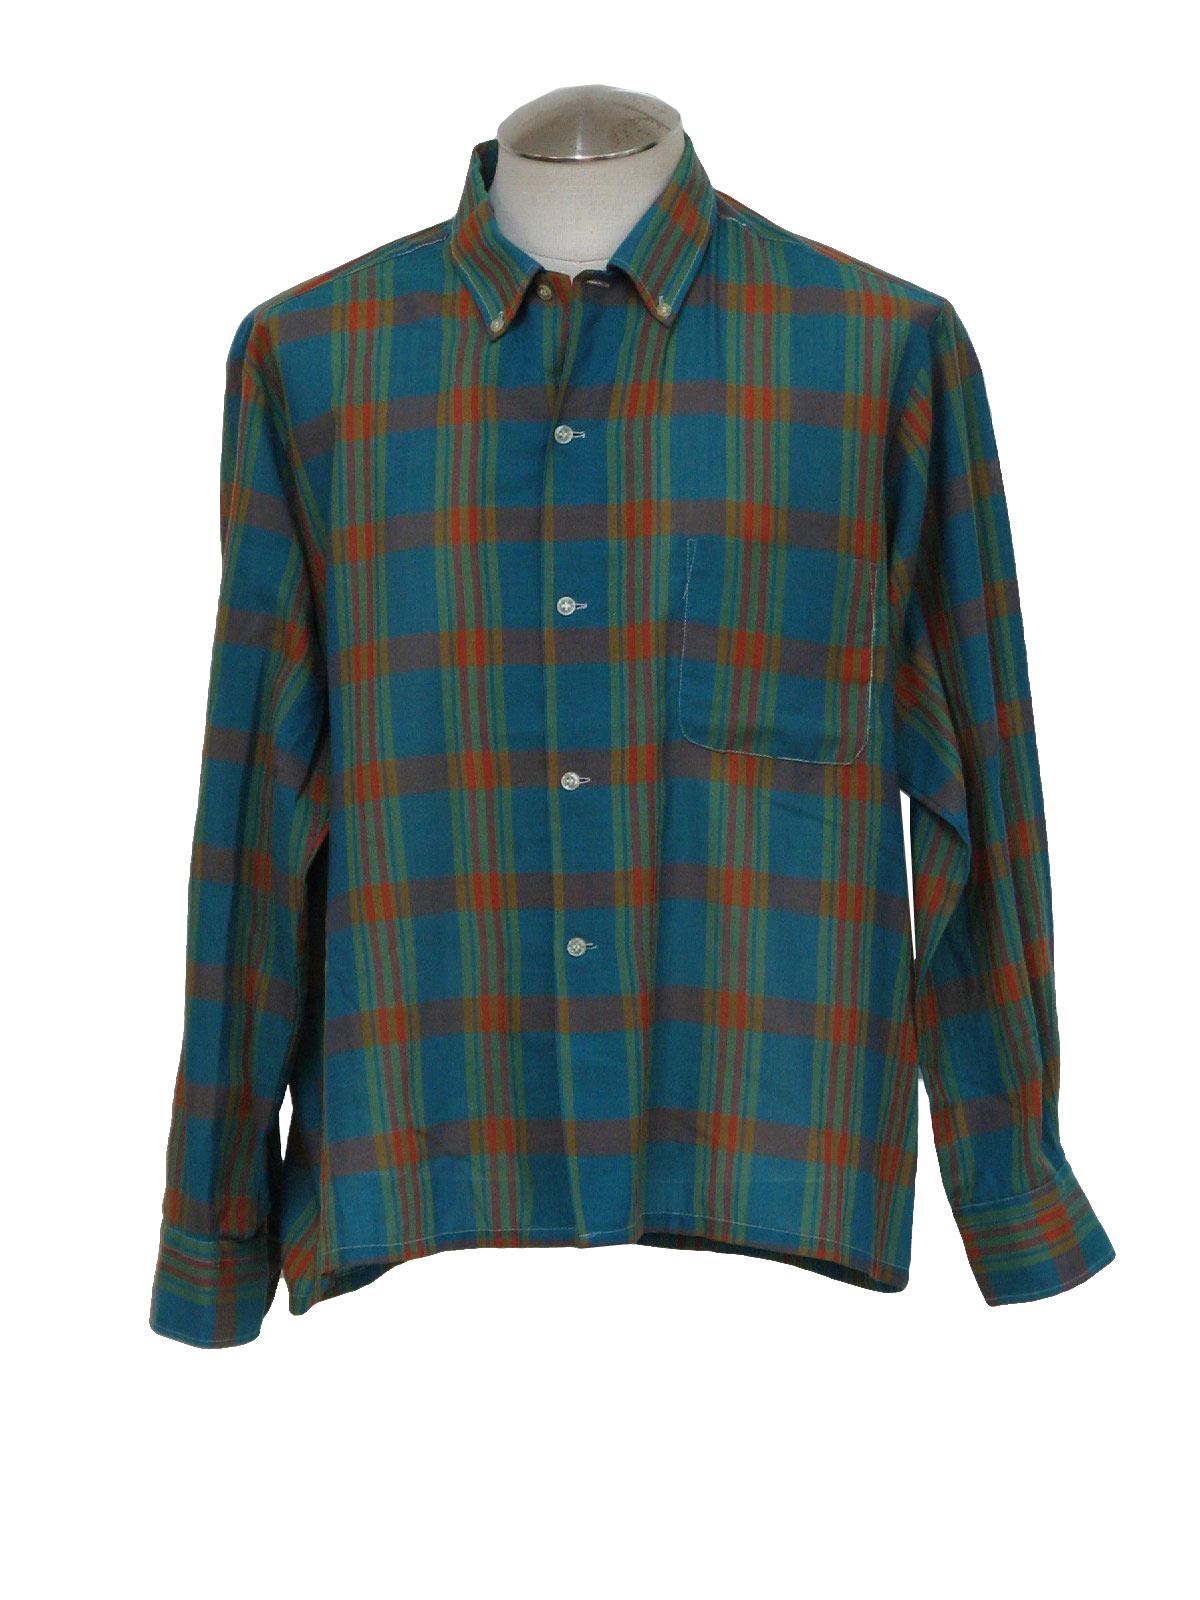 60 39 s kmart permanent press shirt late 60s kmart for Kmart button up shirts